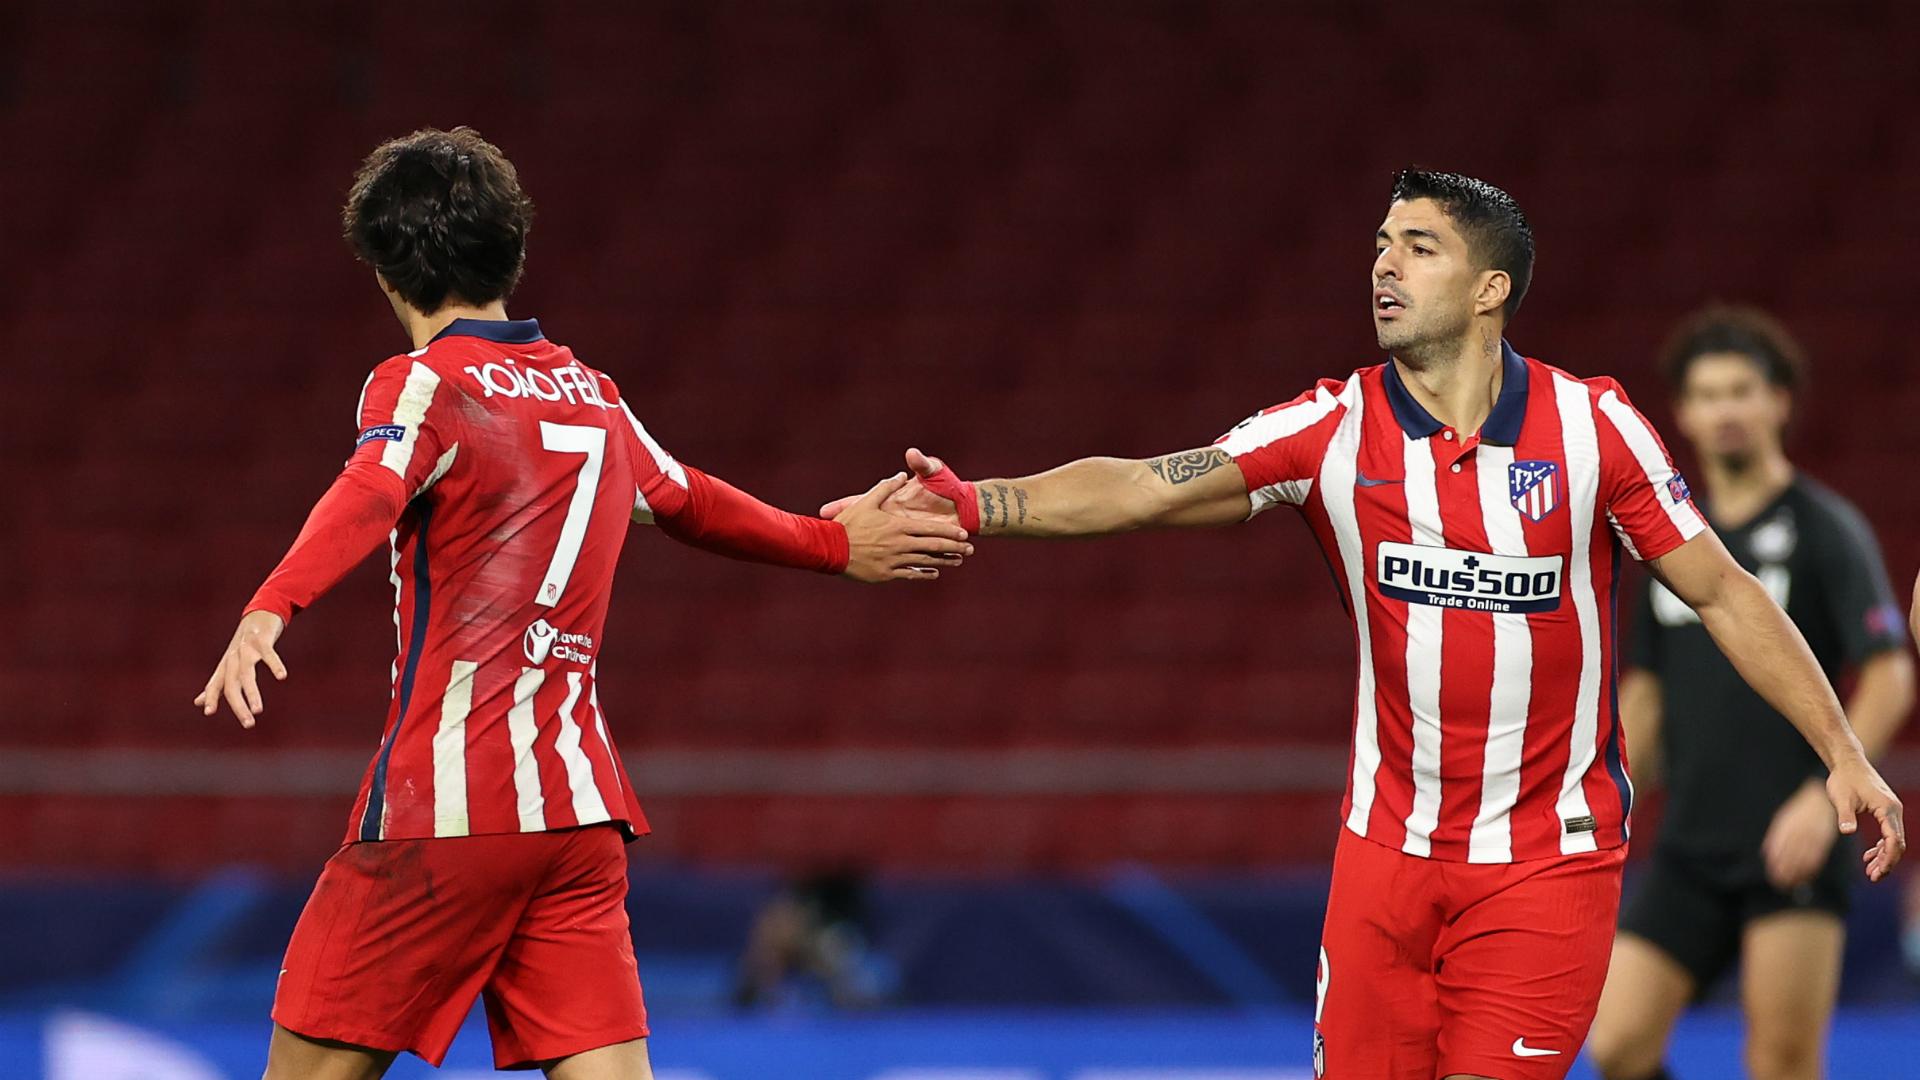 Suarez, Costa and Joao Felix together? - It's still too soon, says Simeone